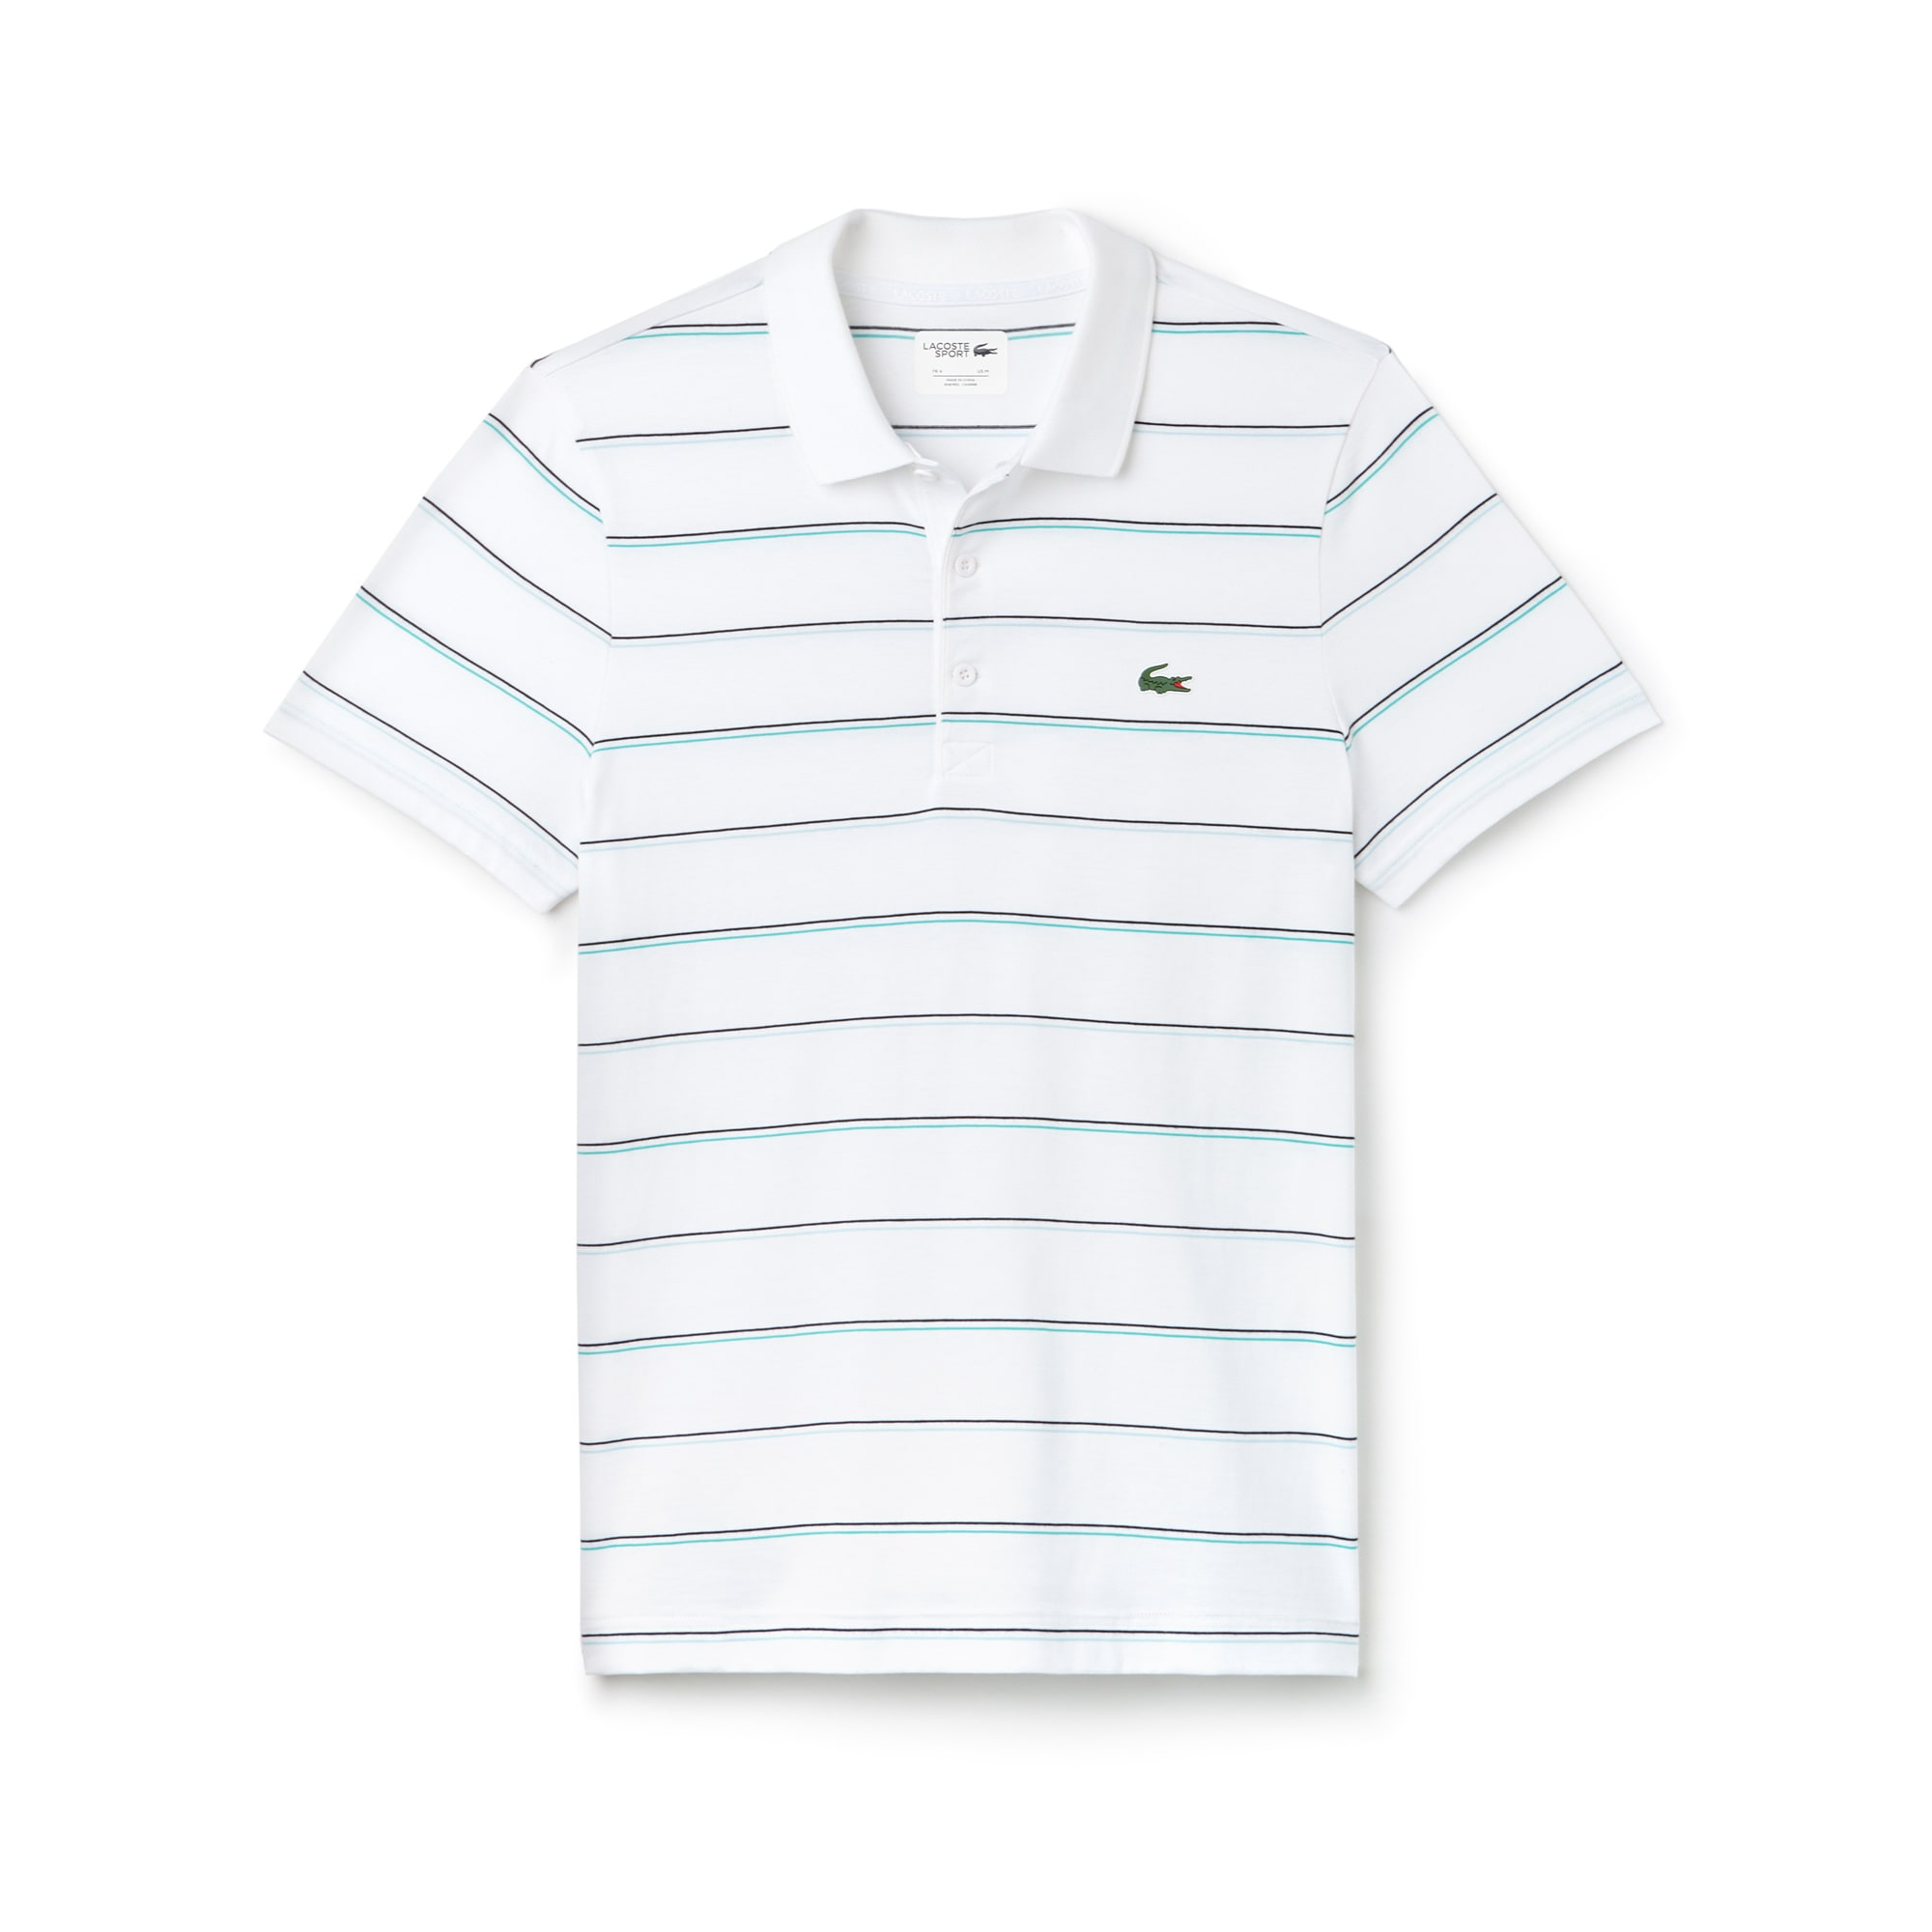 Men's Lacoste SPORT Striped Cotton Jersey Tennis Polo